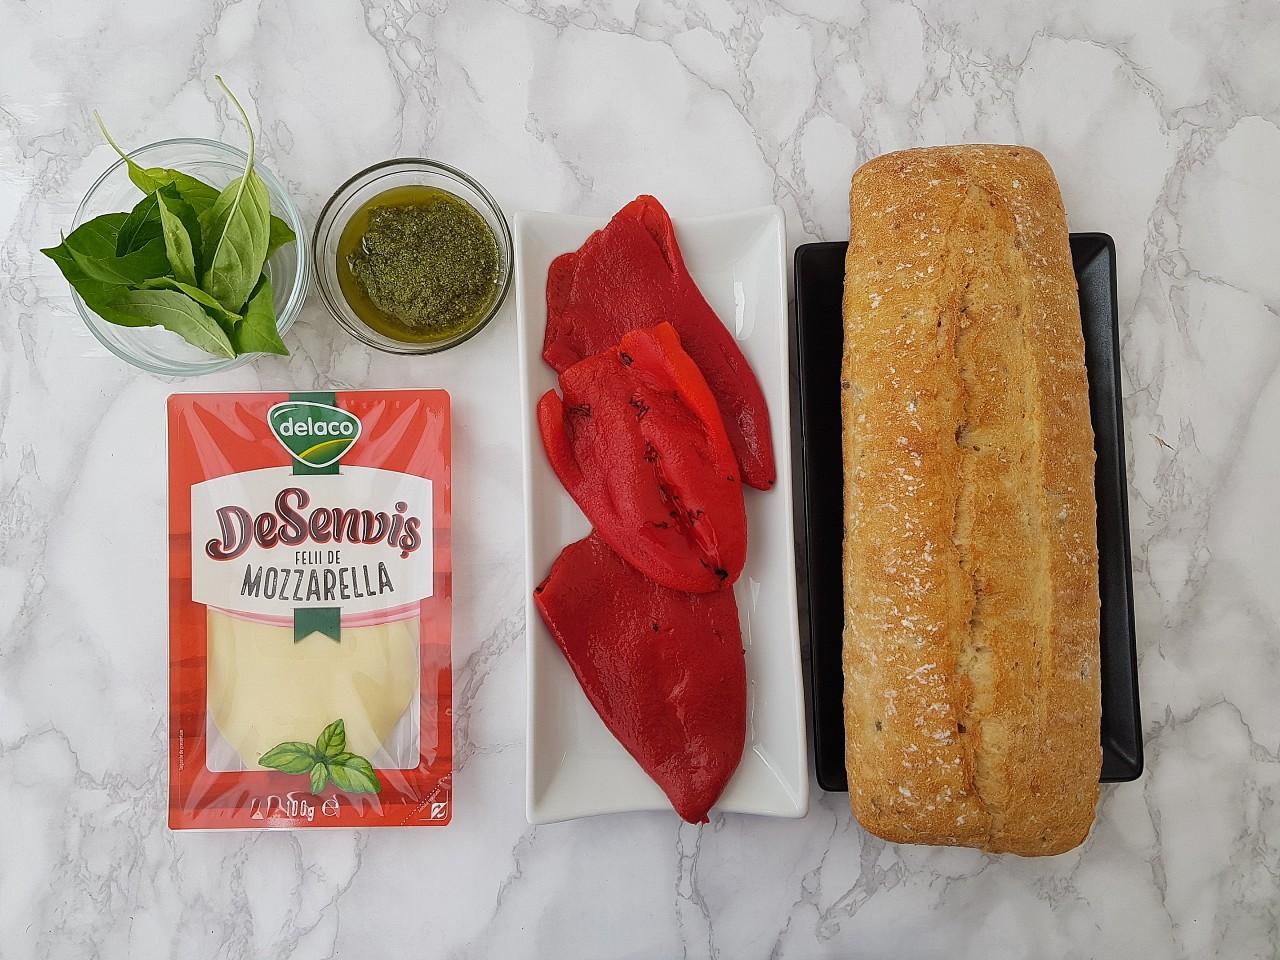 Sandwich cu mozzarella si ardei copt - foodieopedia